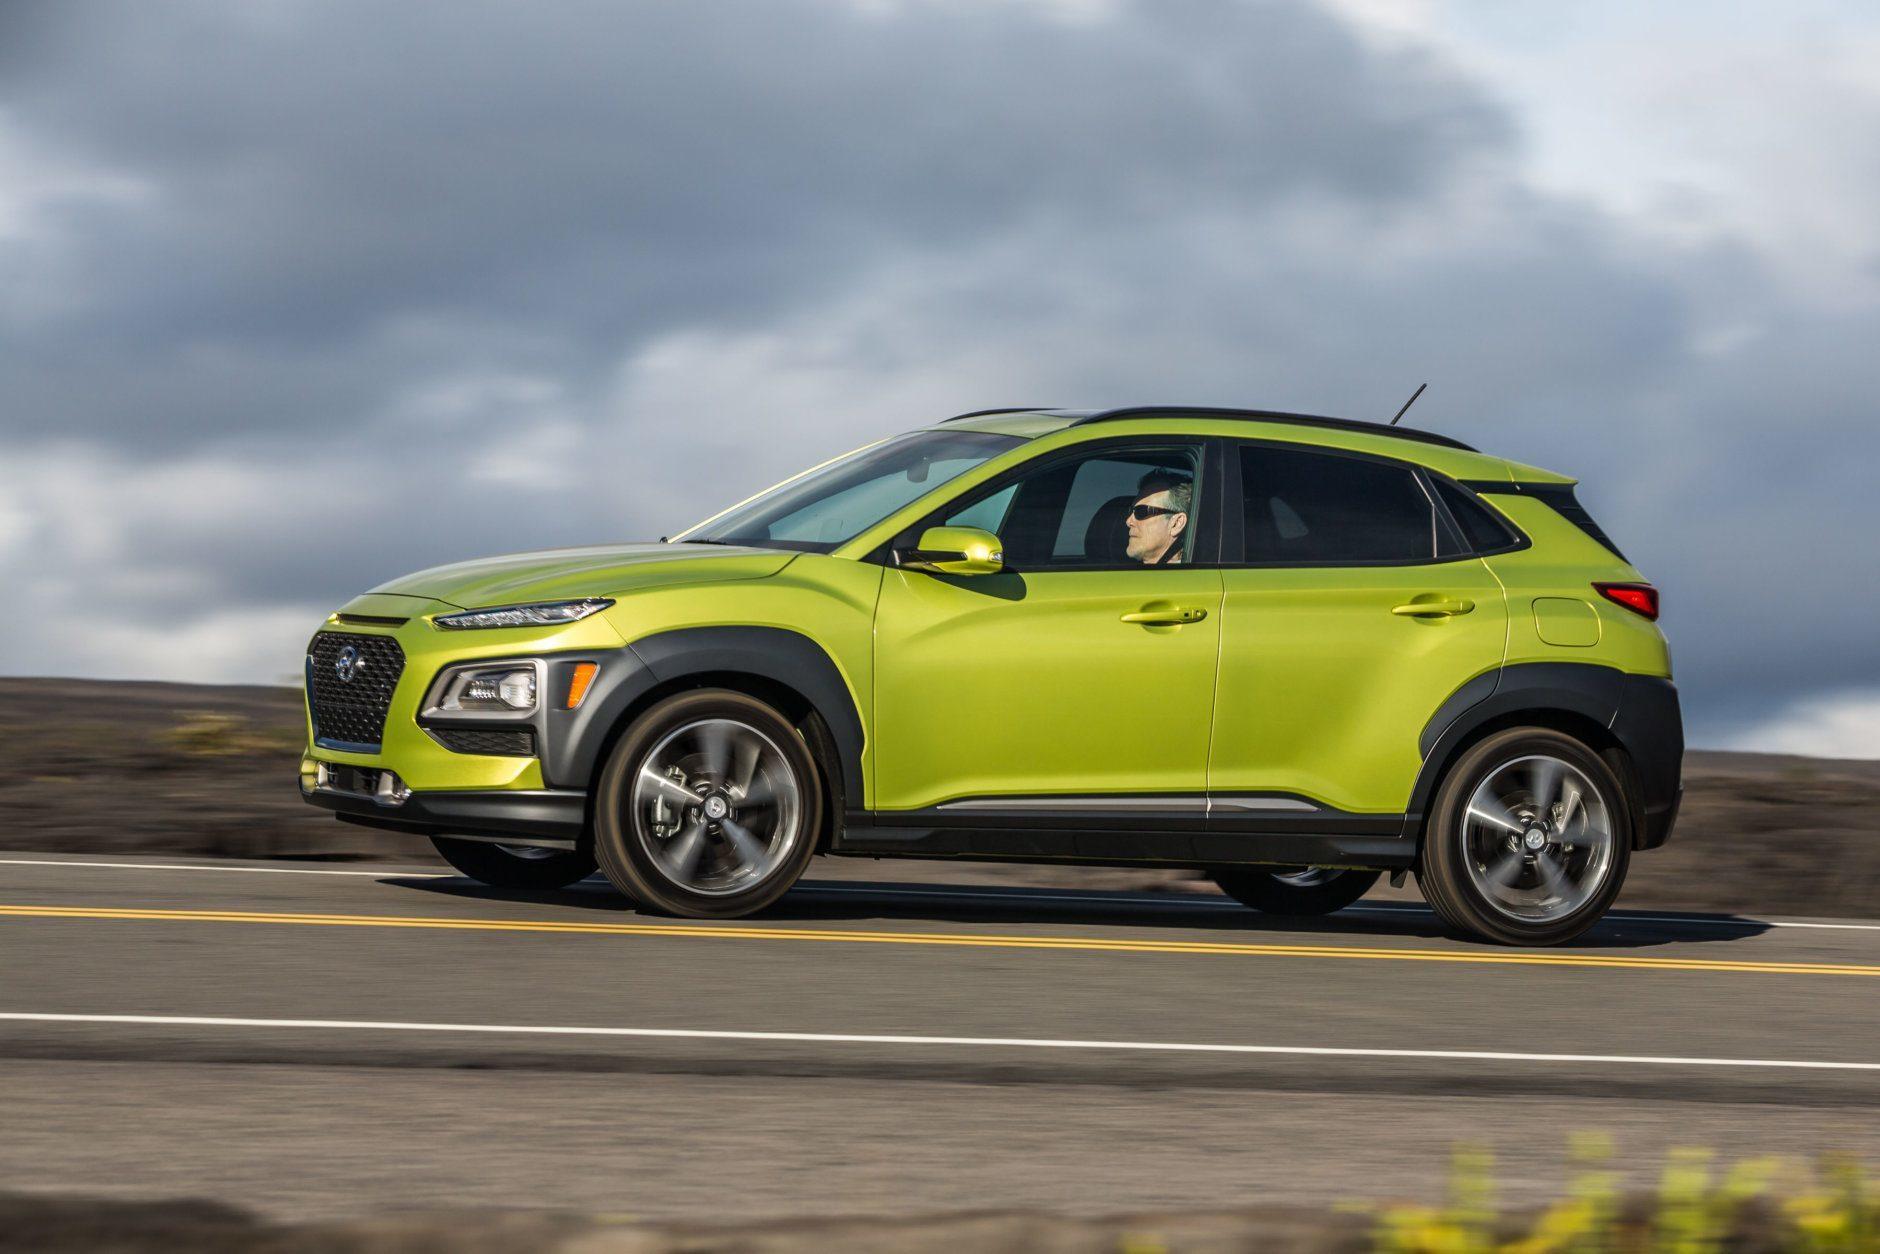 15 best new-car deals for Memorial Day weekend | WTOP